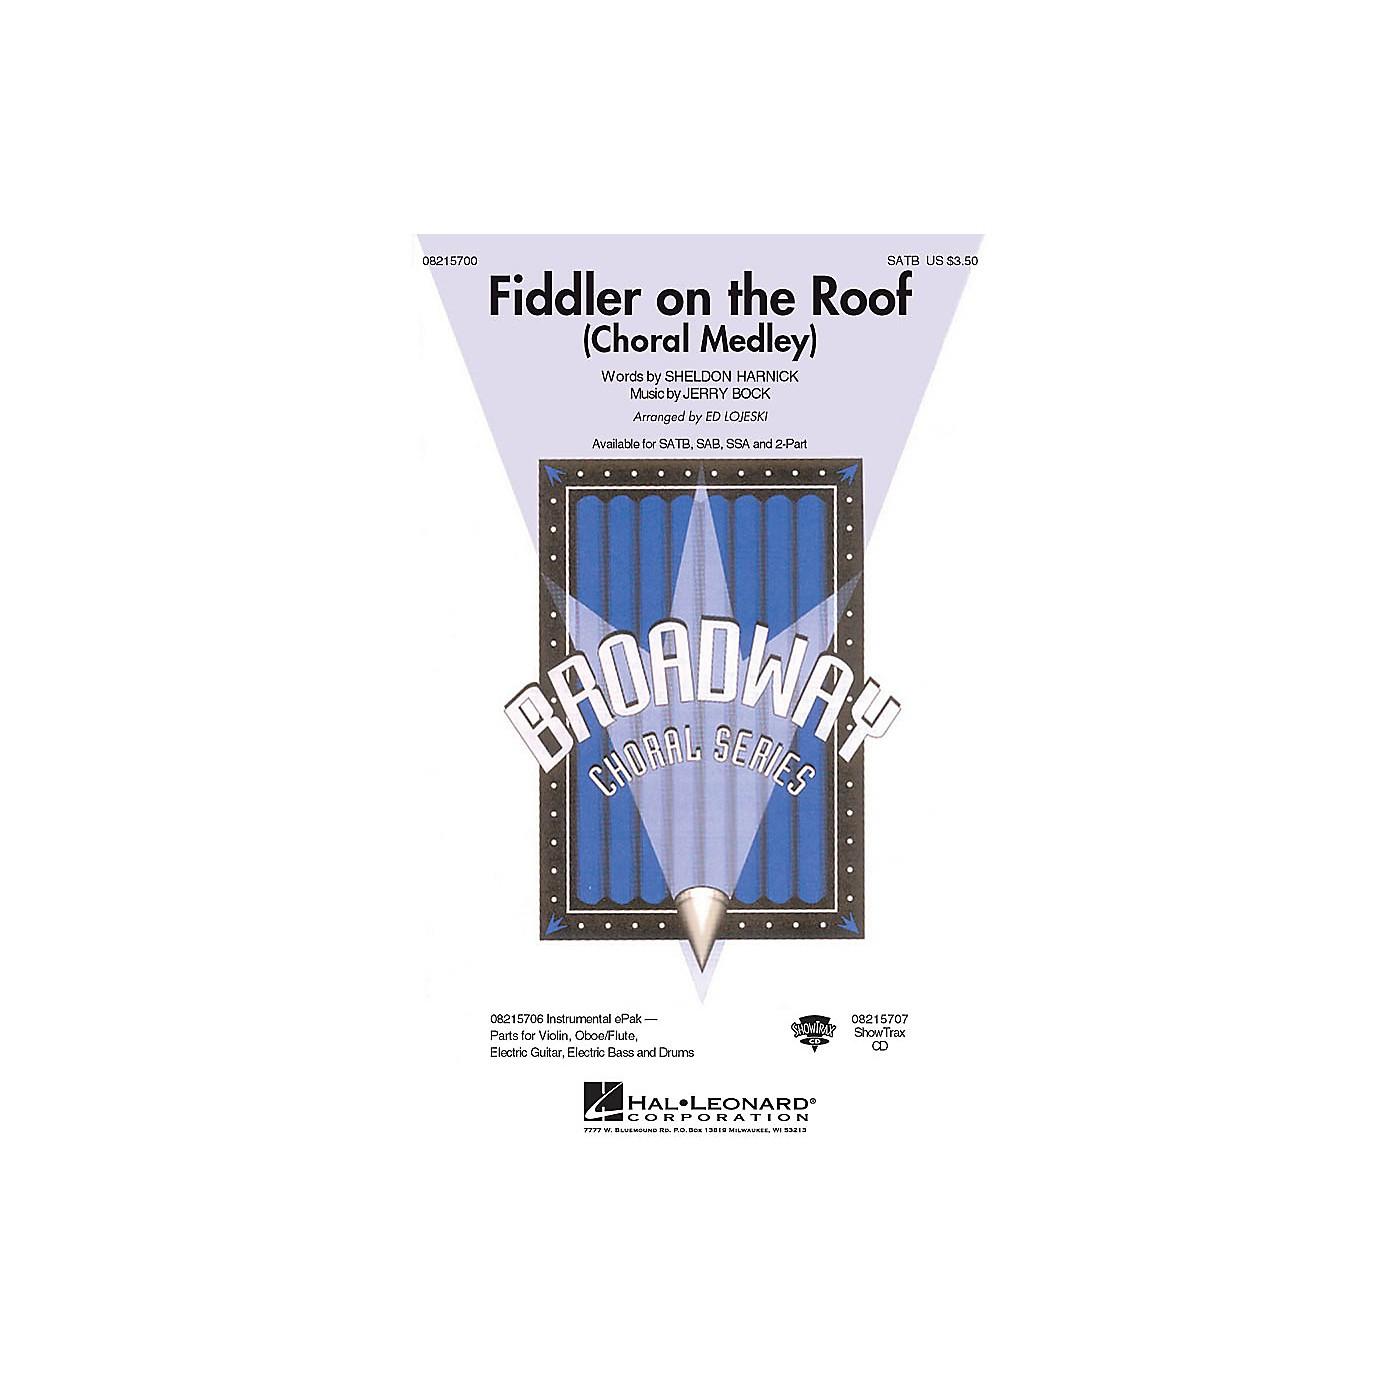 Hal Leonard Fiddler on the Roof (Choral Medley) SATB arranged by Ed Lojeski thumbnail